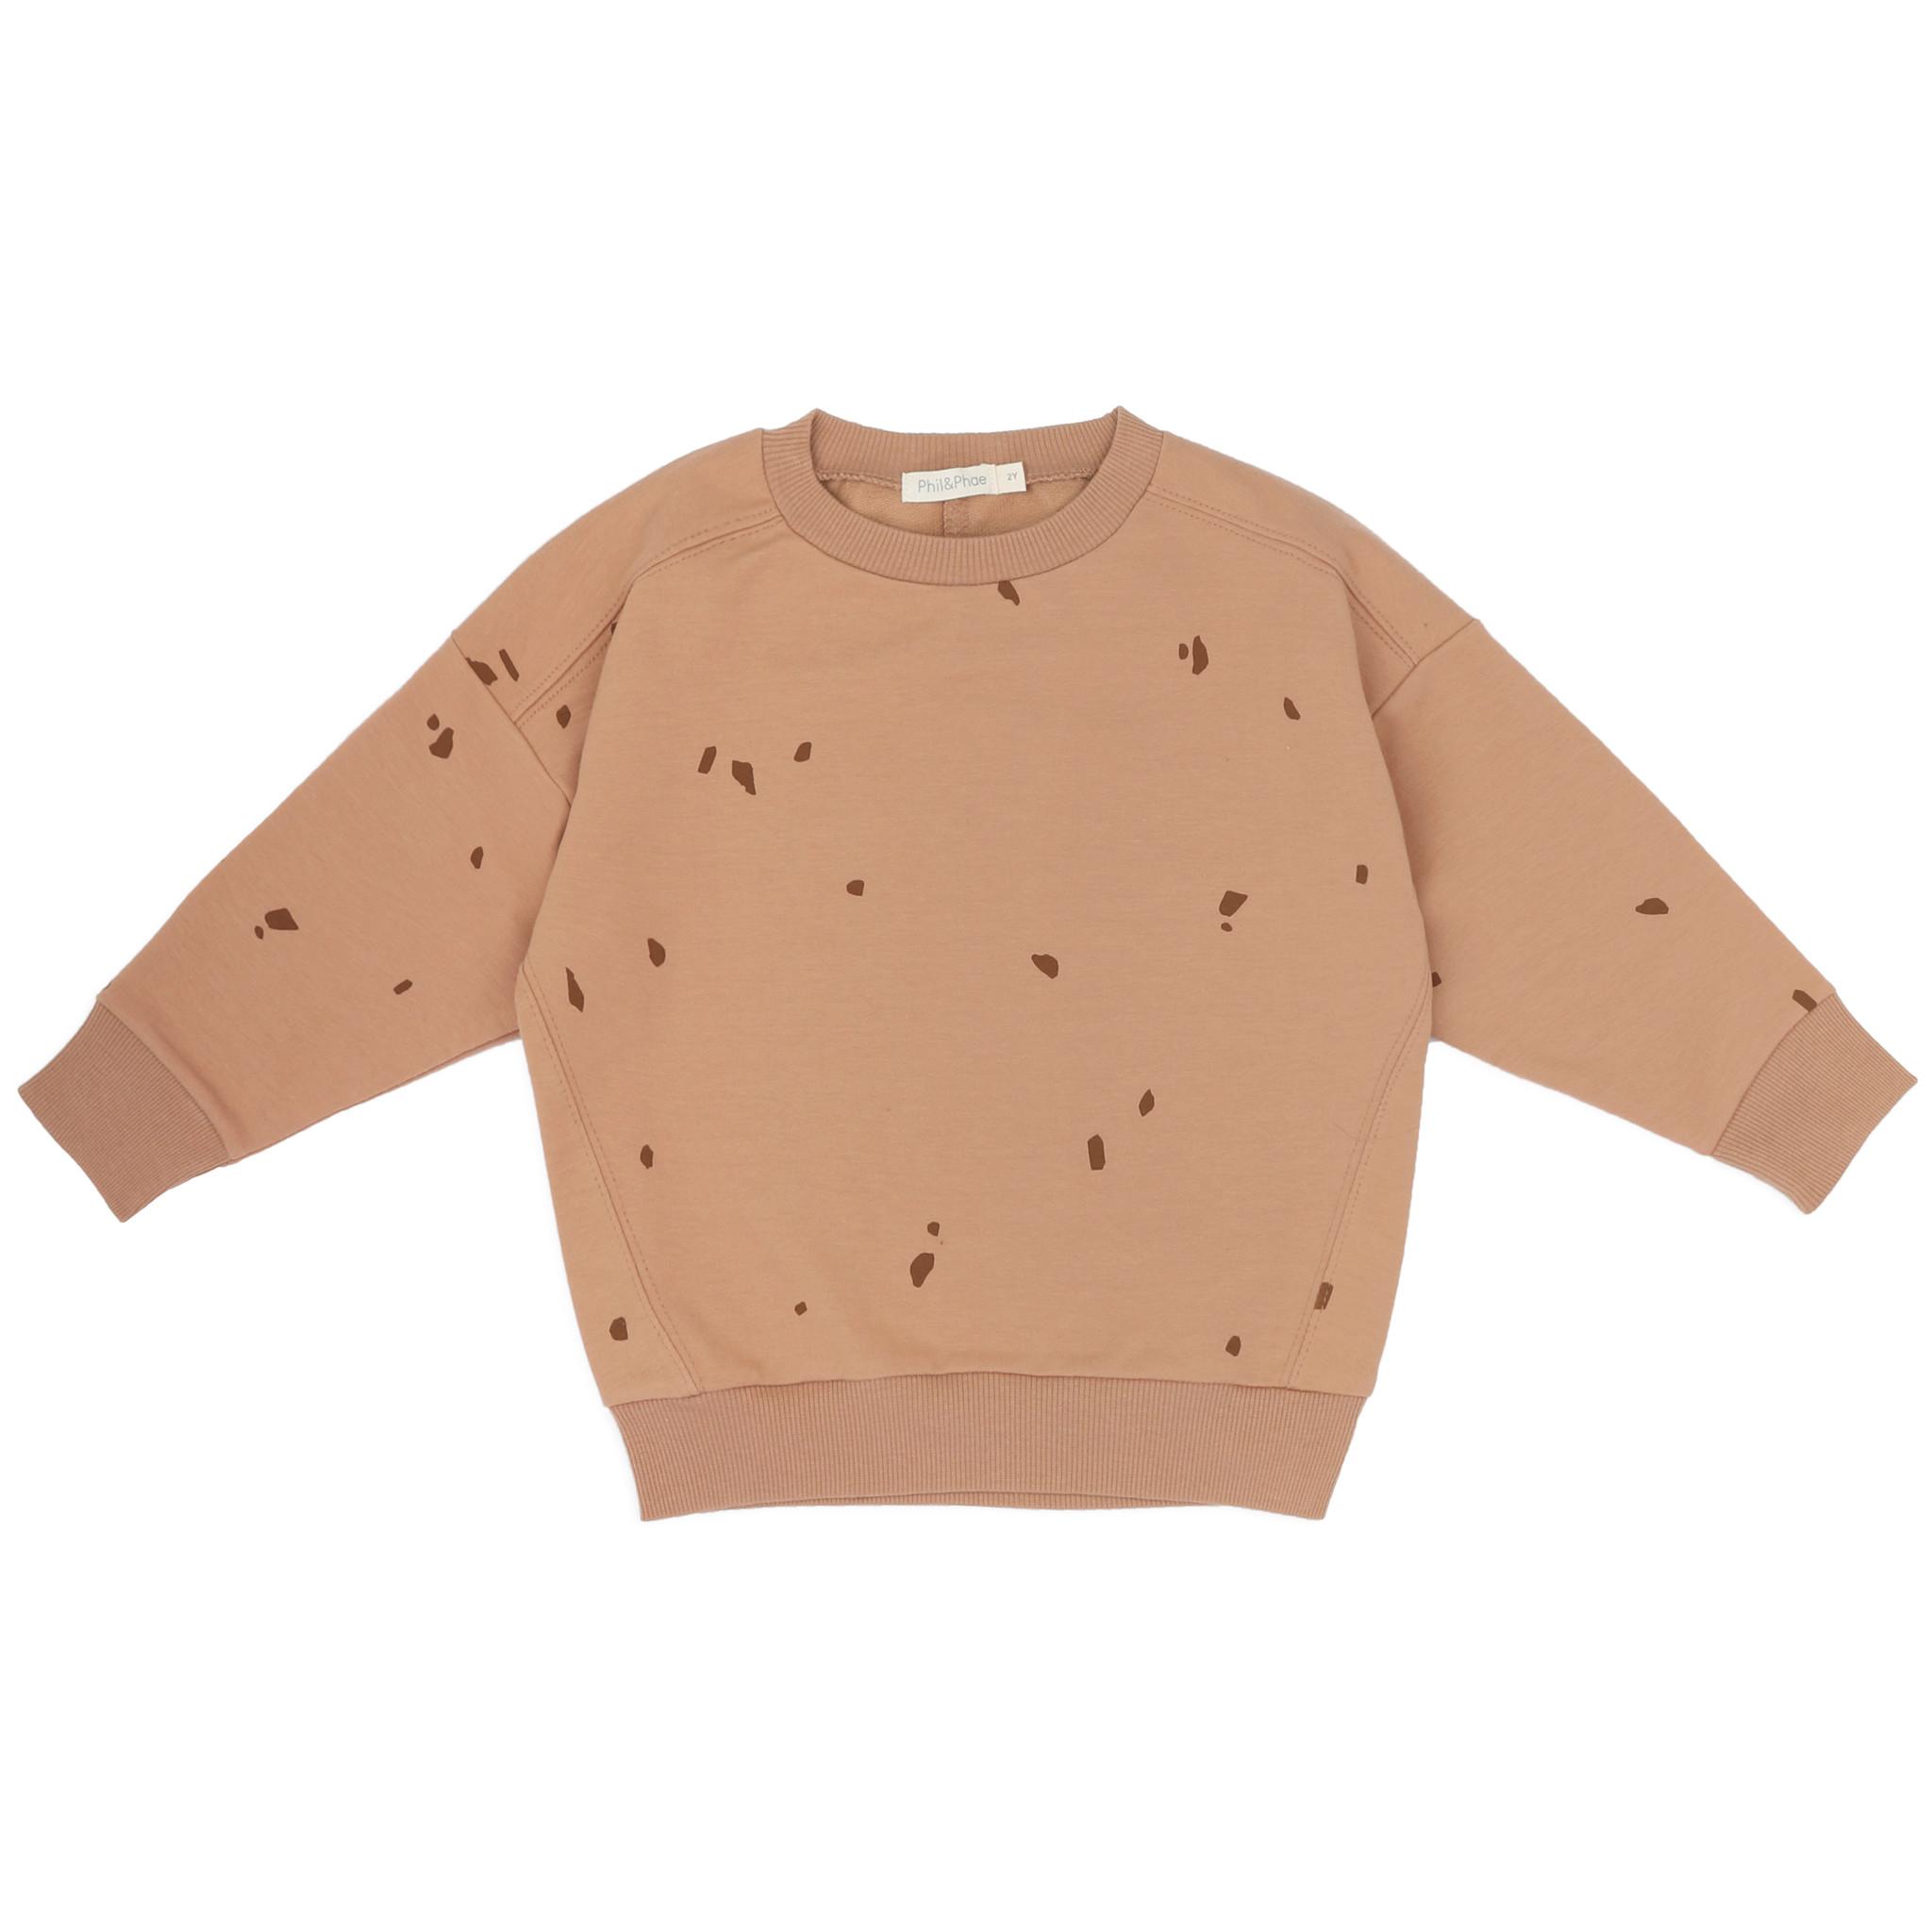 Oversized summer sweater stones - warm biscuit-1